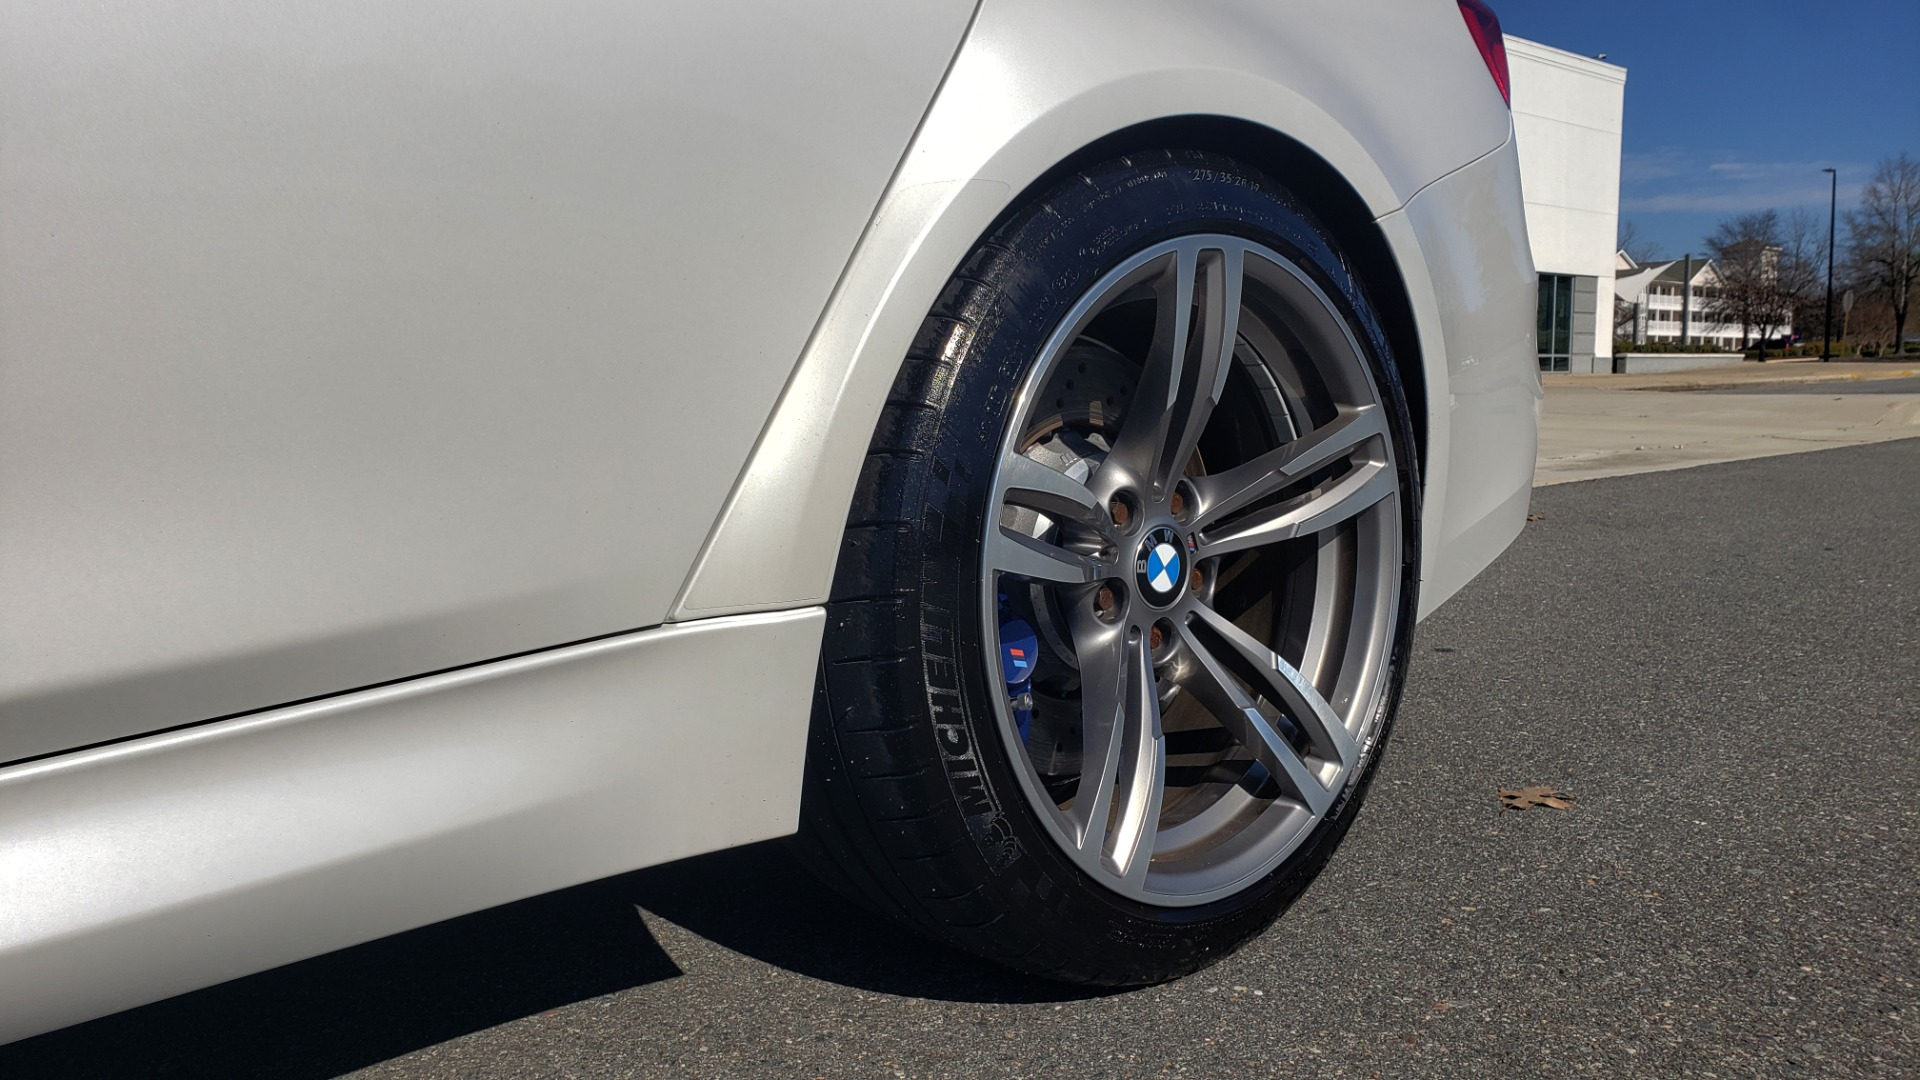 Used 2016 BMW M3 SEDAN / EXECUTIVE PKG / M-SUSPENSION / HARMAN/KARDON SOUND for sale Sold at Formula Imports in Charlotte NC 28227 11